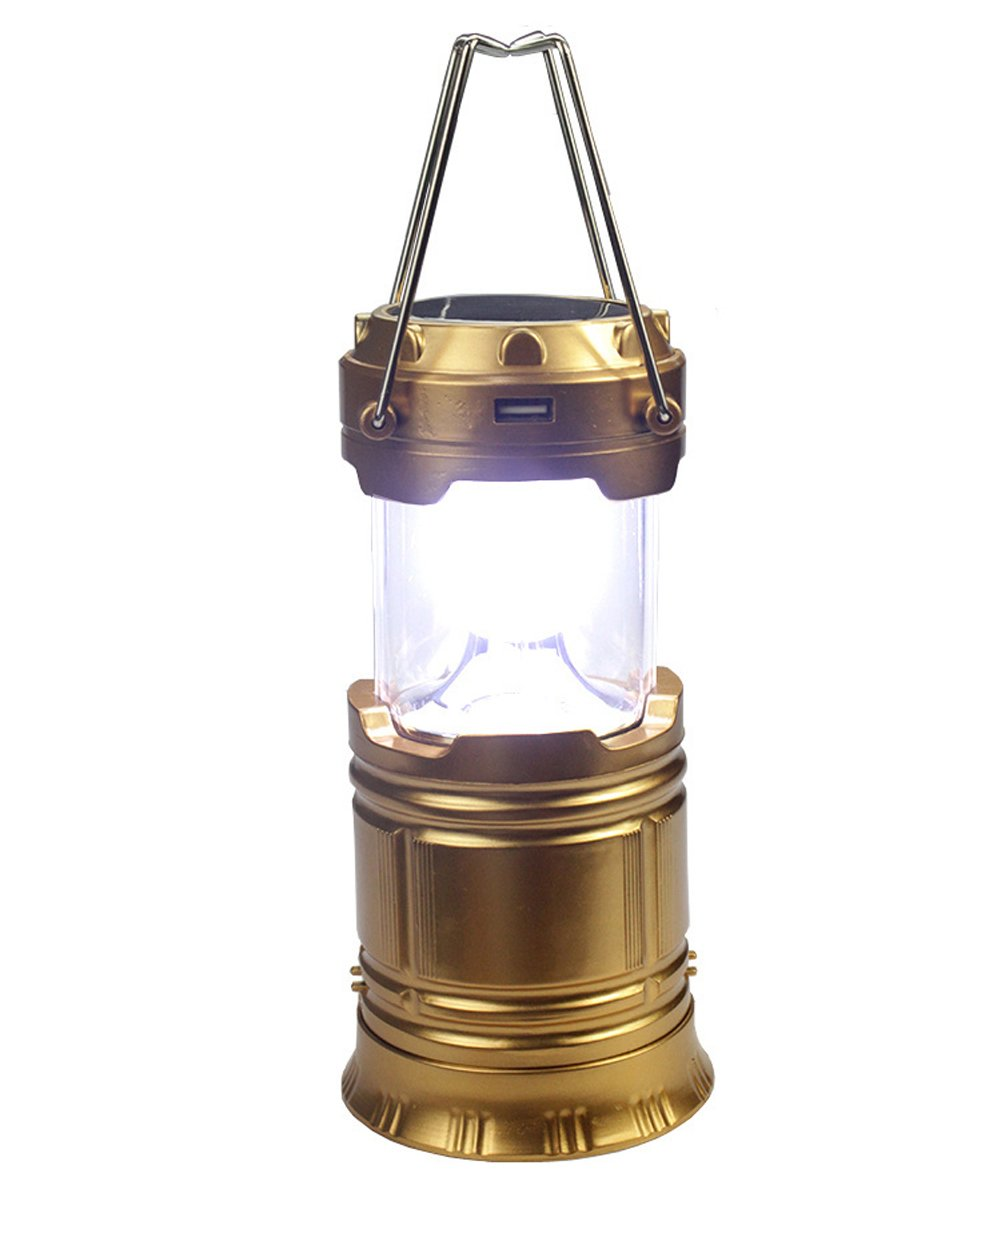 Jiangu Super Bright Solar-Outdoor Camping Lampe, Camping Lampe Portable Emergency Lamp LED Zelt Licht Laterne wiederaufladbar Beleuchtung